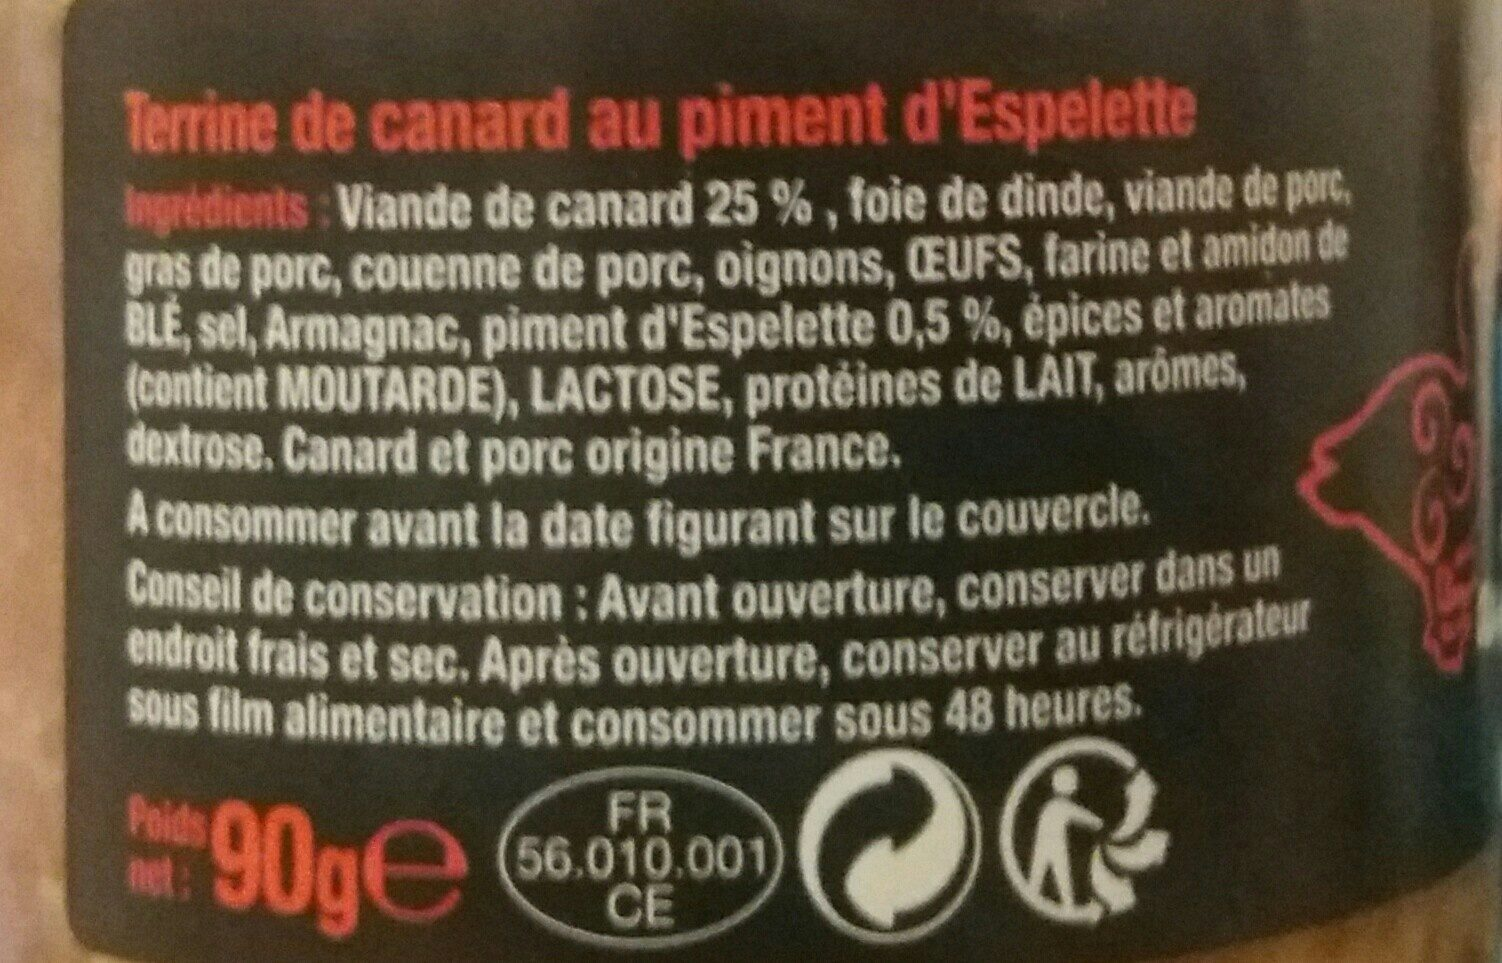 Canard piment espelette - Ingrediënten